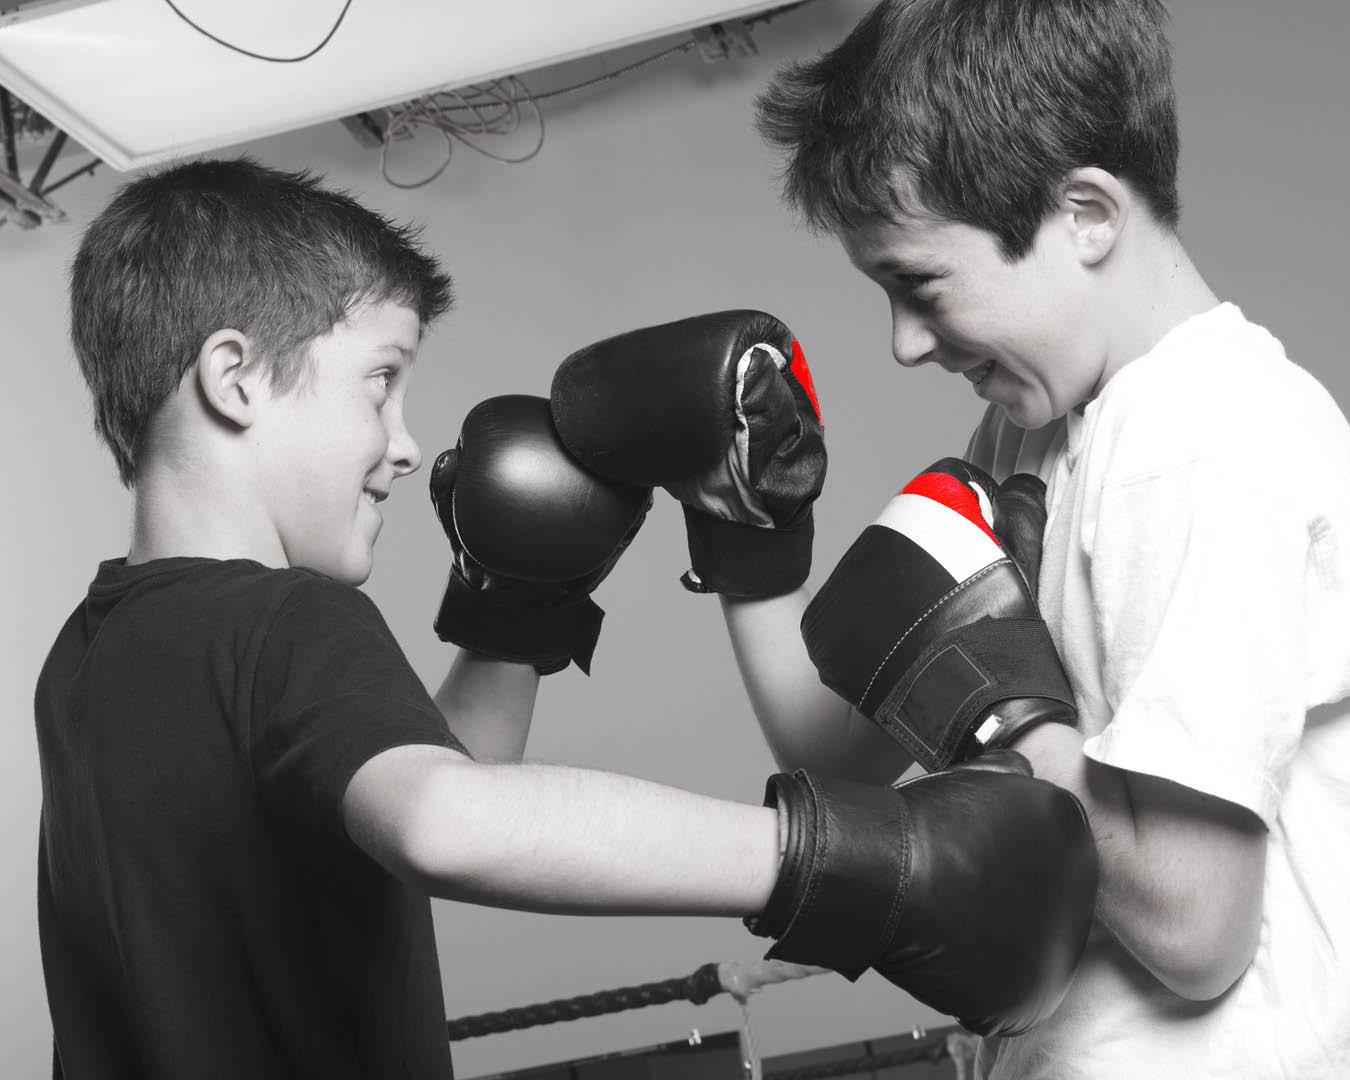 Boxen Schüler